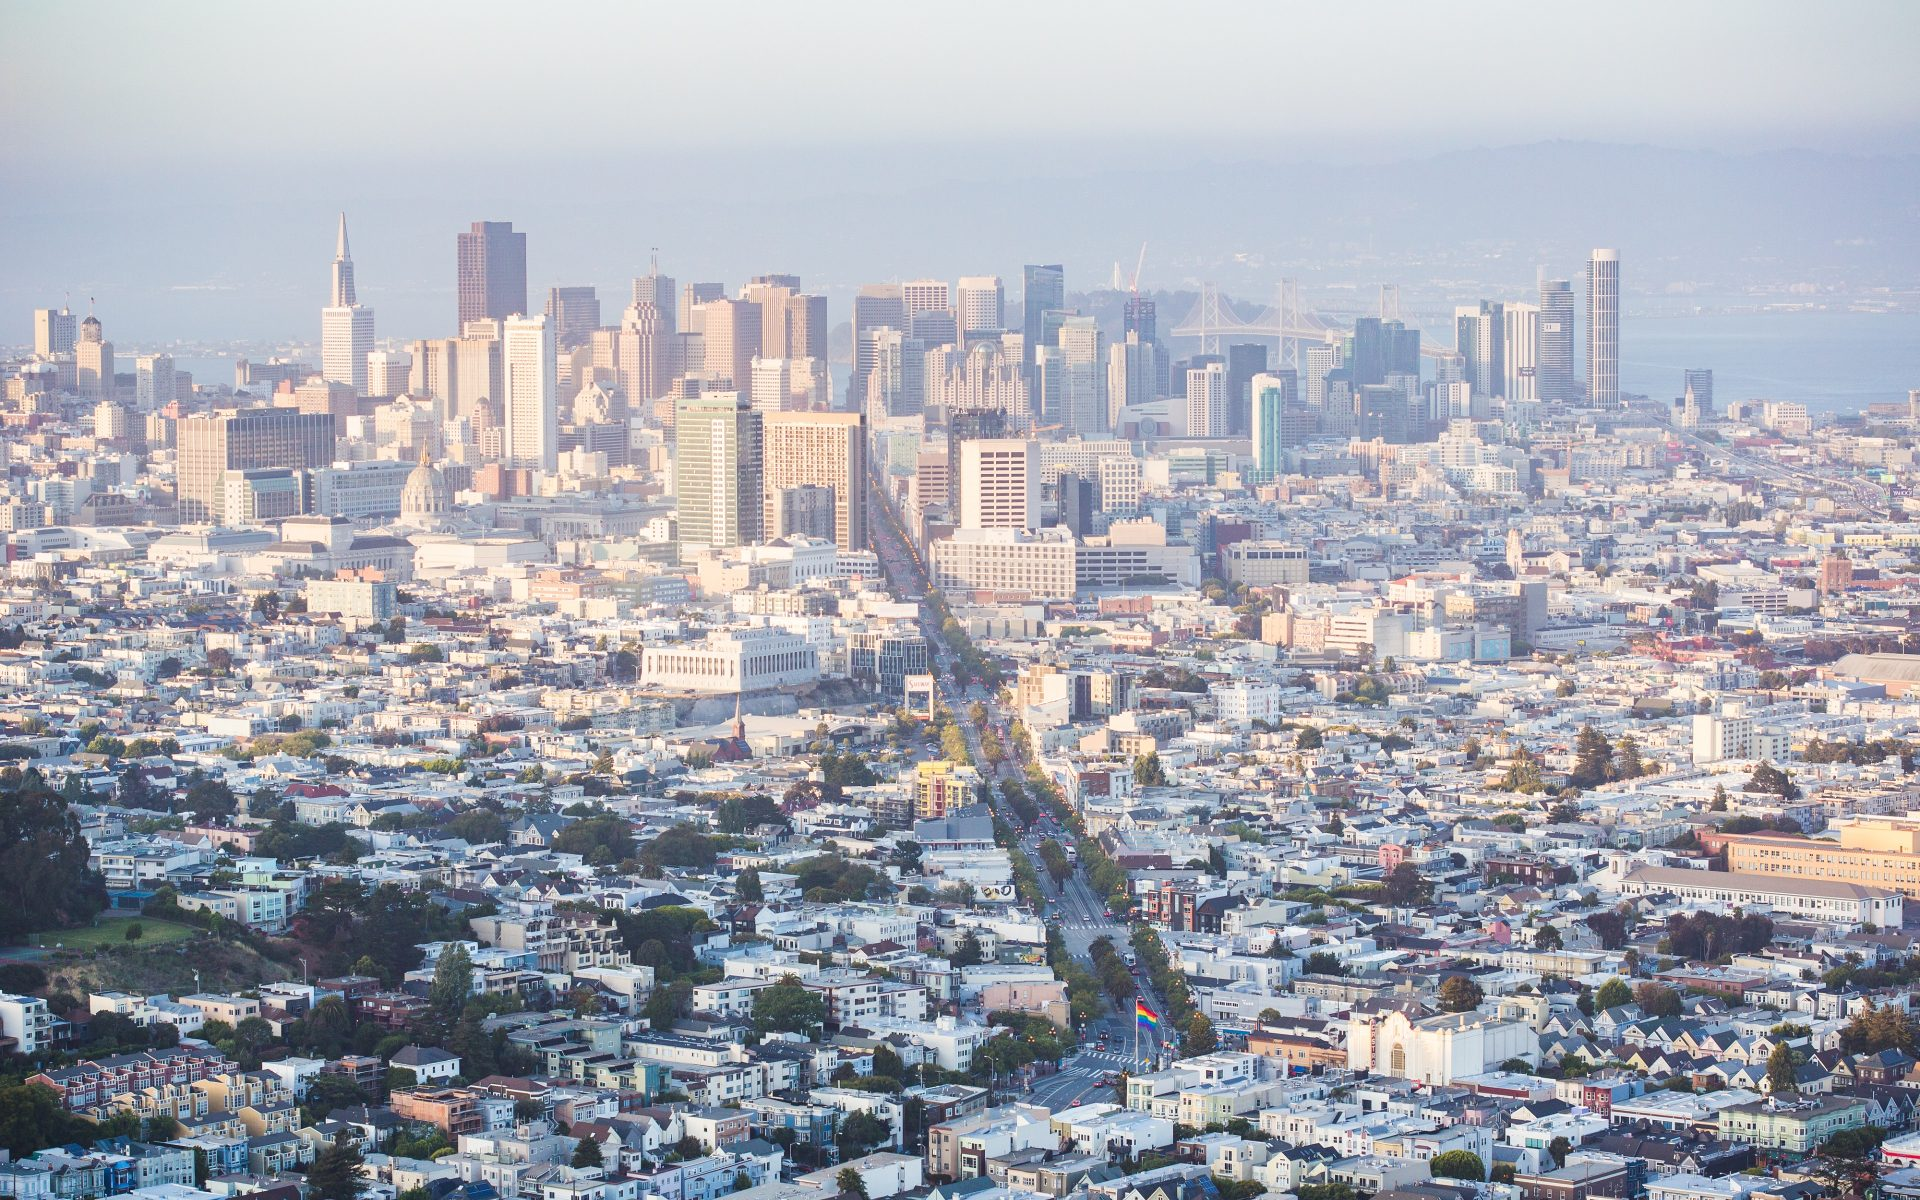 cityscape view wallpaper 4k background